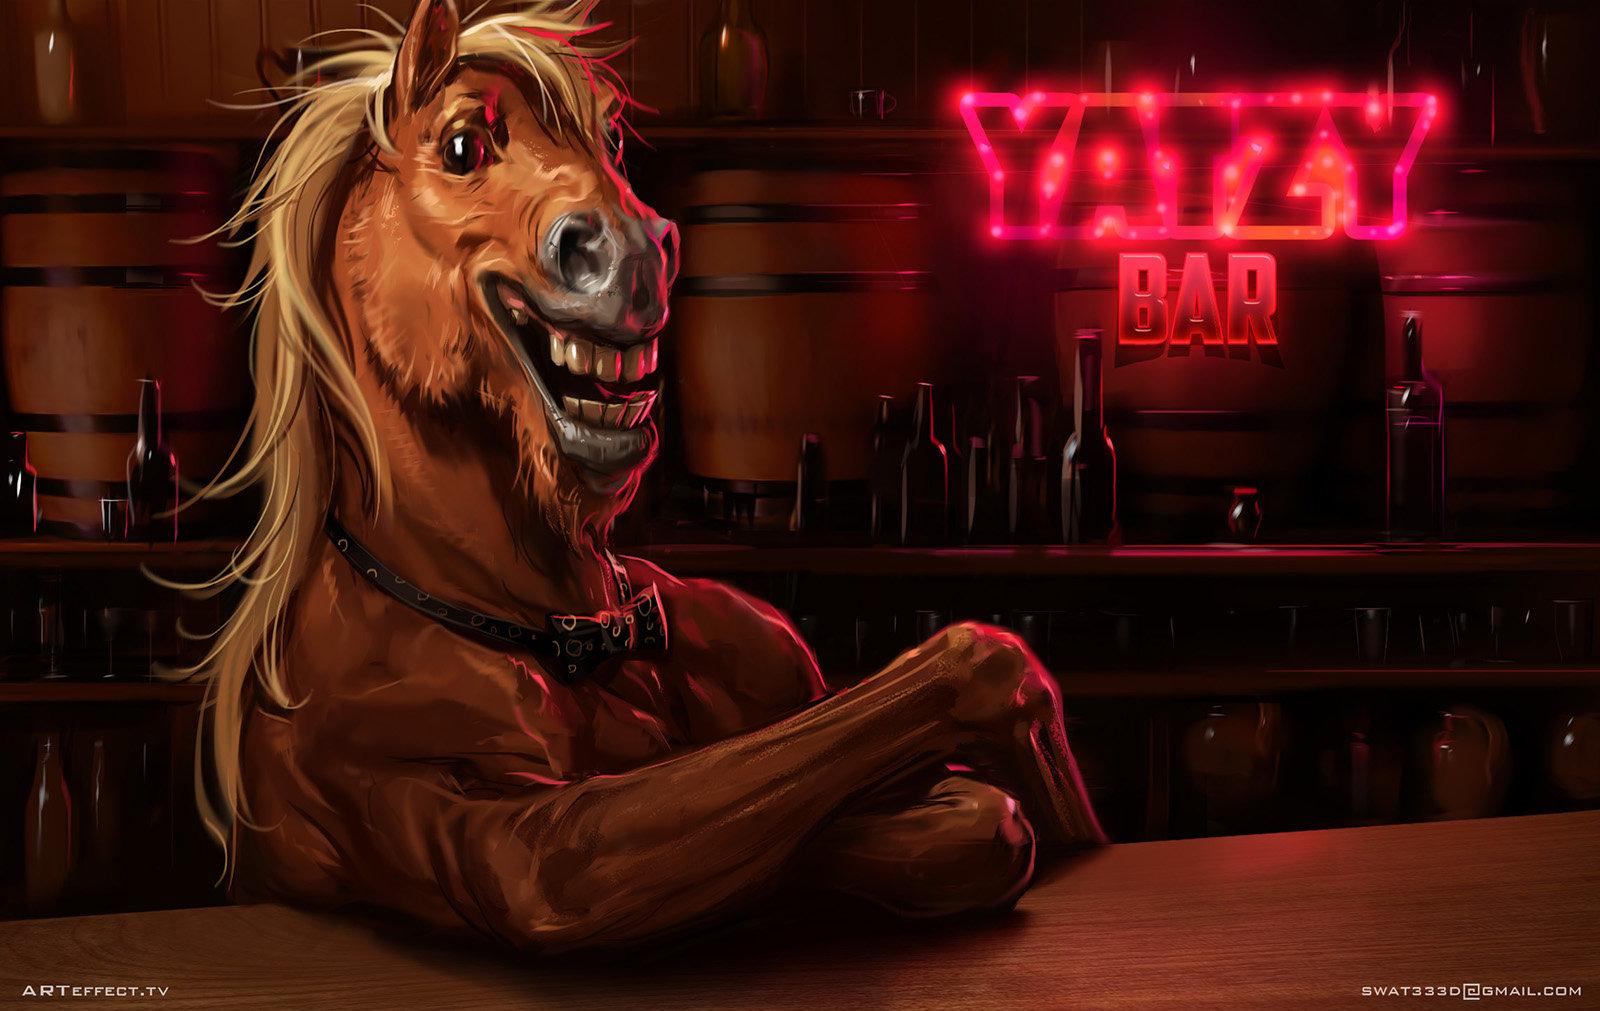 Sviatoslav gerasimchuk laughs horse